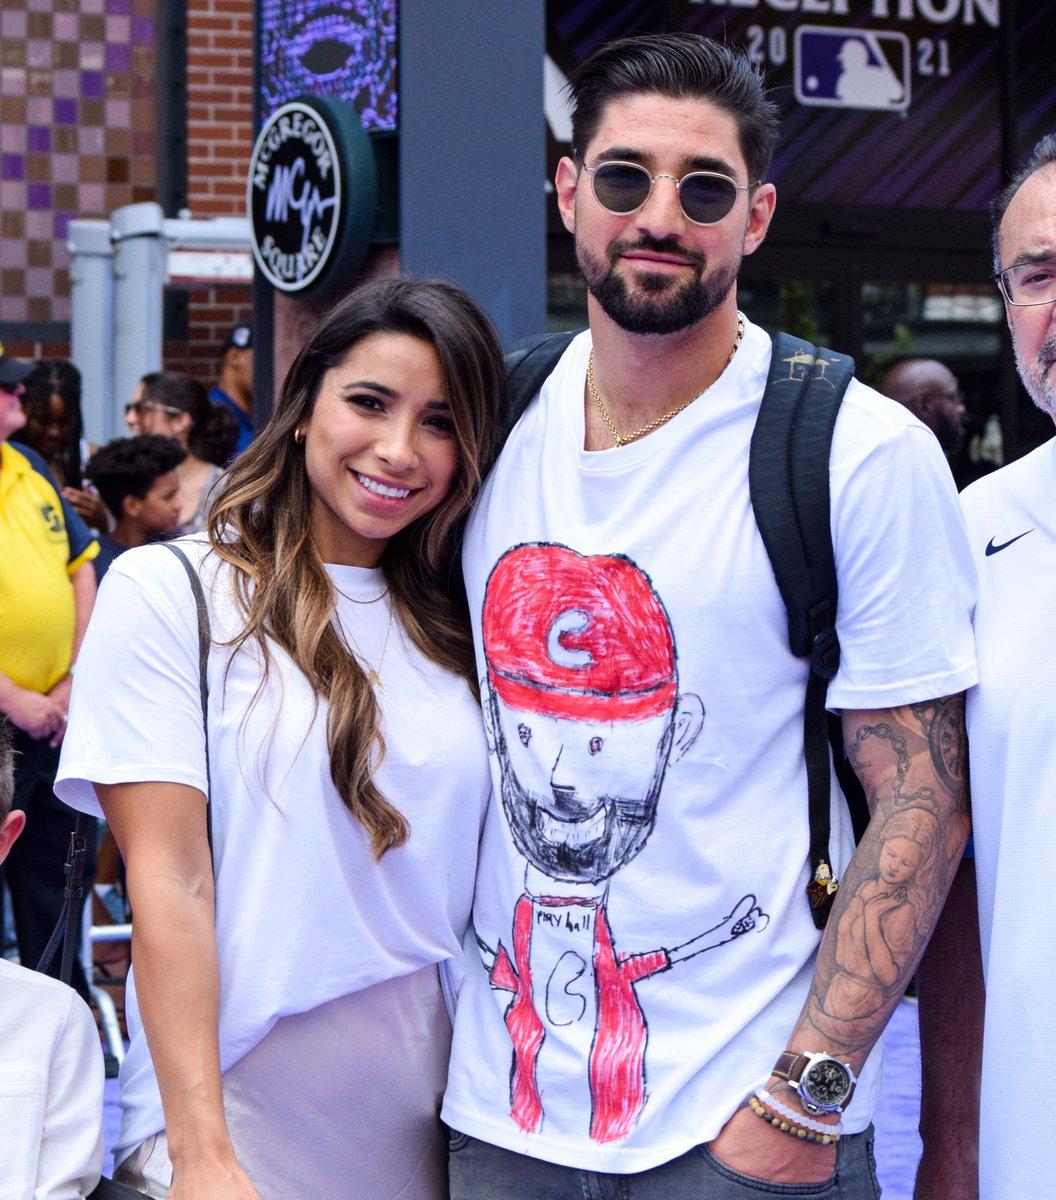 Cincy Shirts begins selling famous Nick Castellanos t-shirt